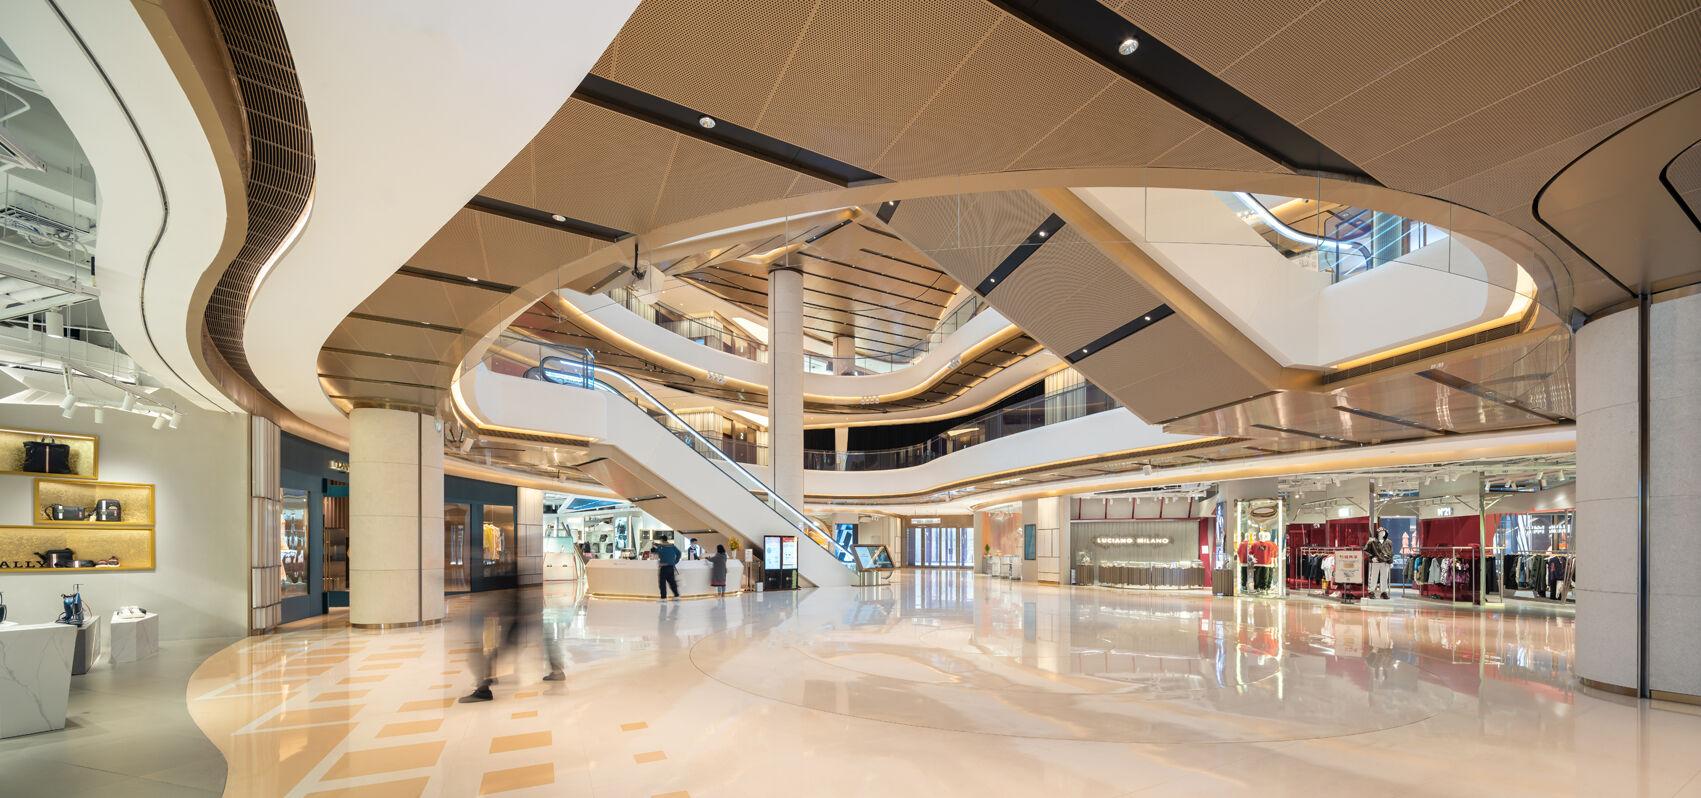 the big atrium on the 1st floor.jpg